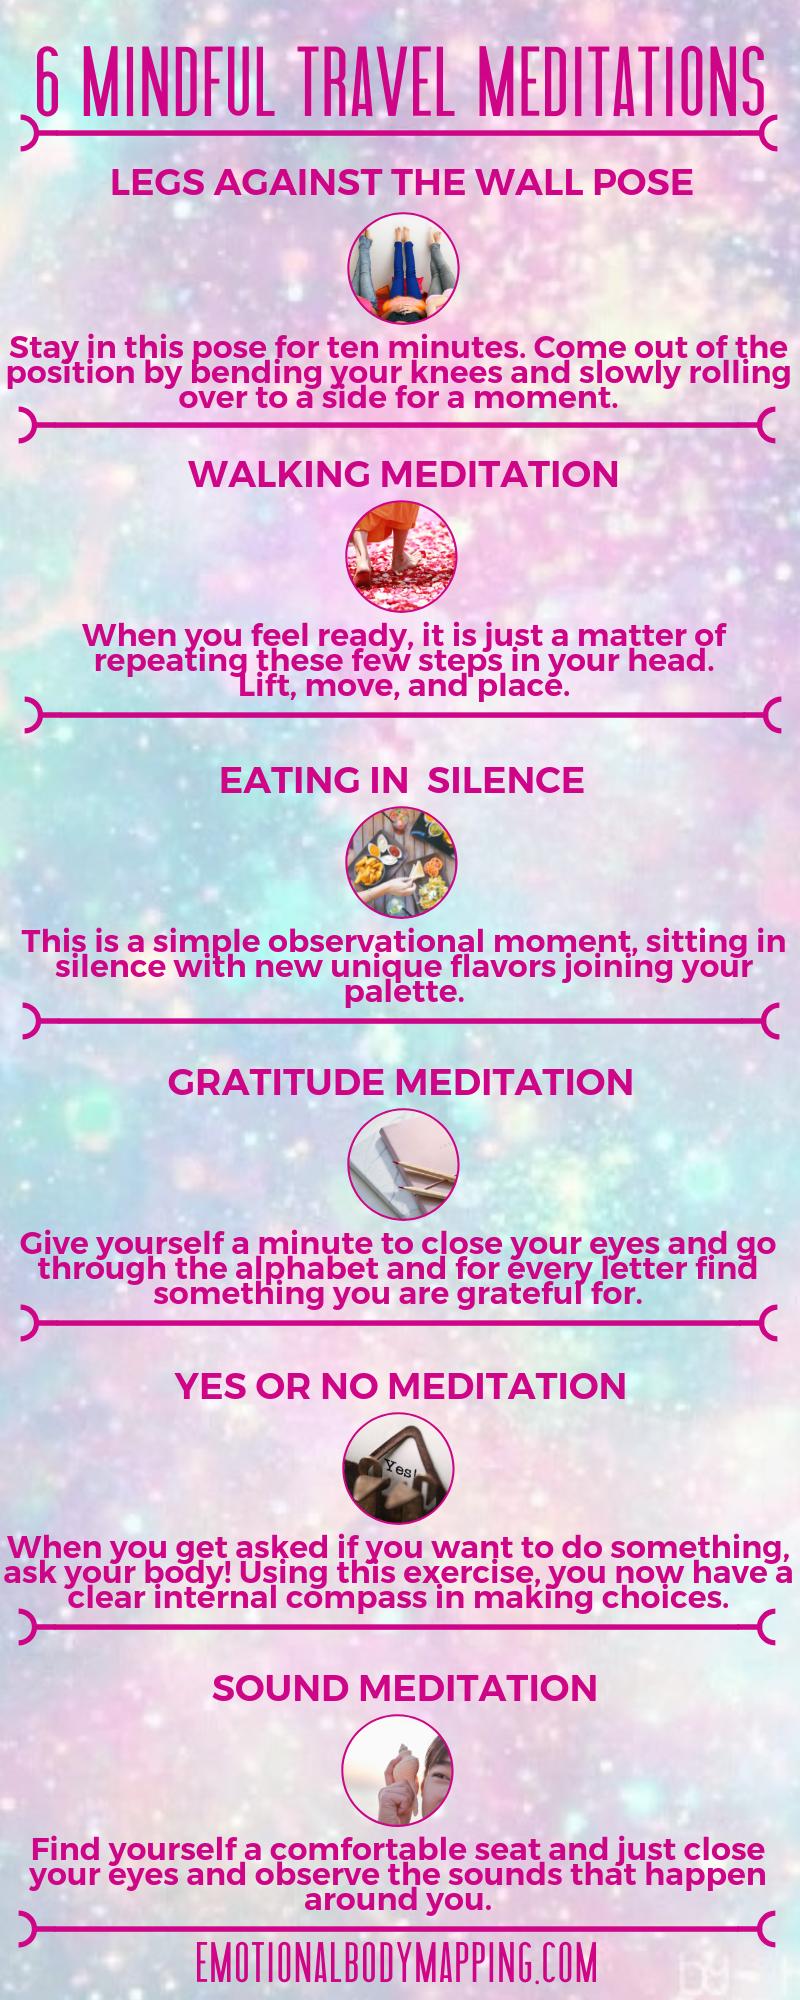 6 mindful travel meditations